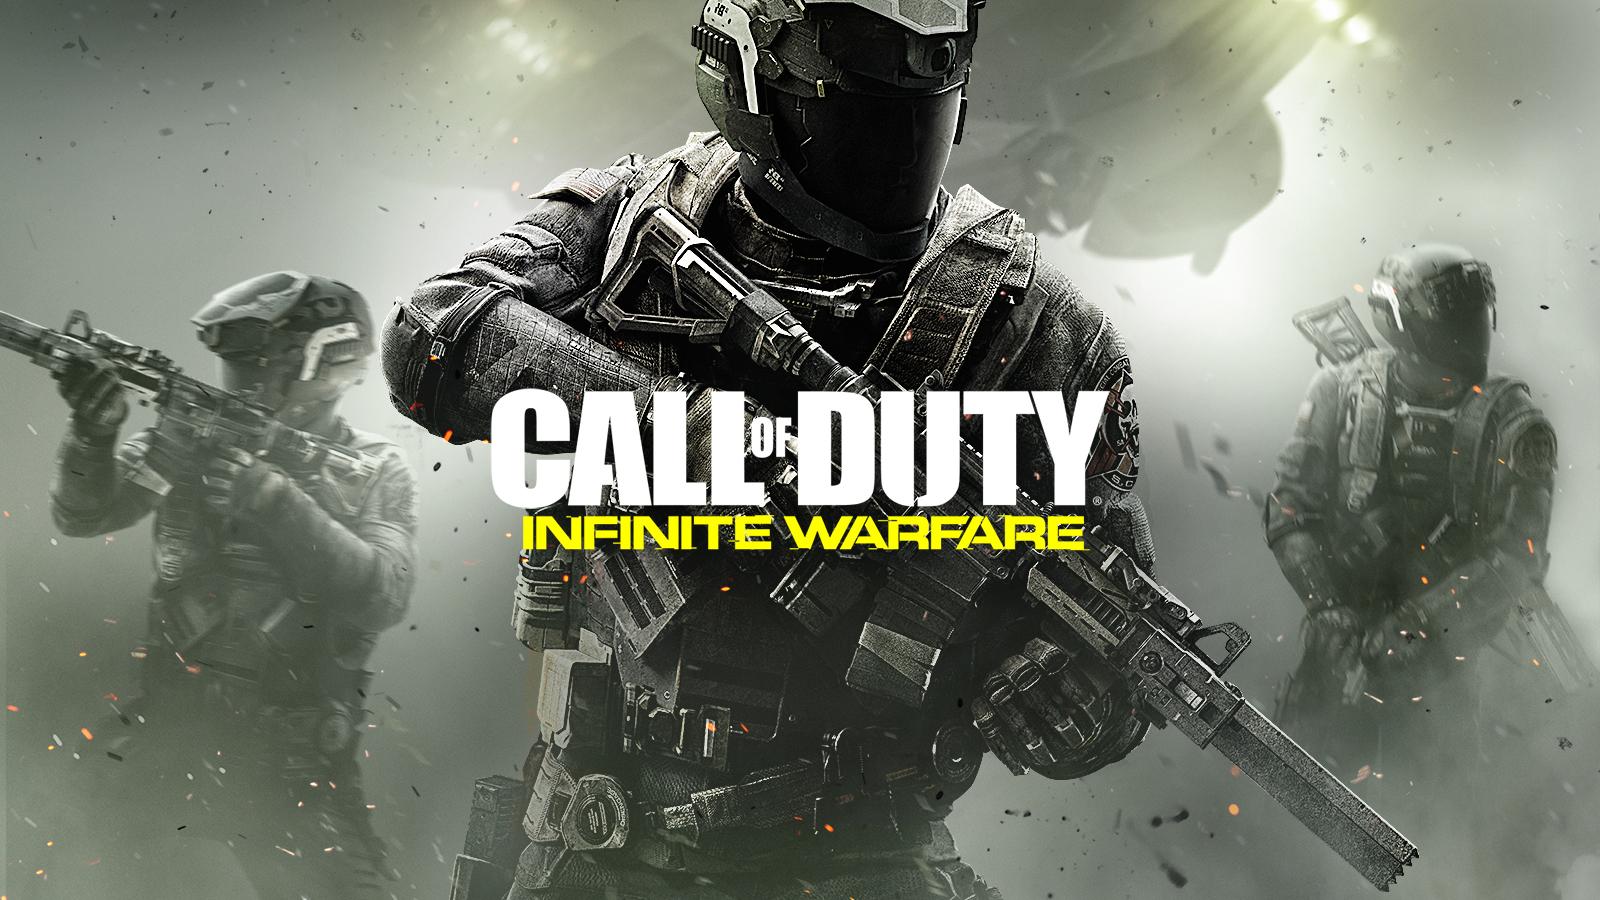 Revelados nuevos detalles de Call of Duty: Infinite Warfare